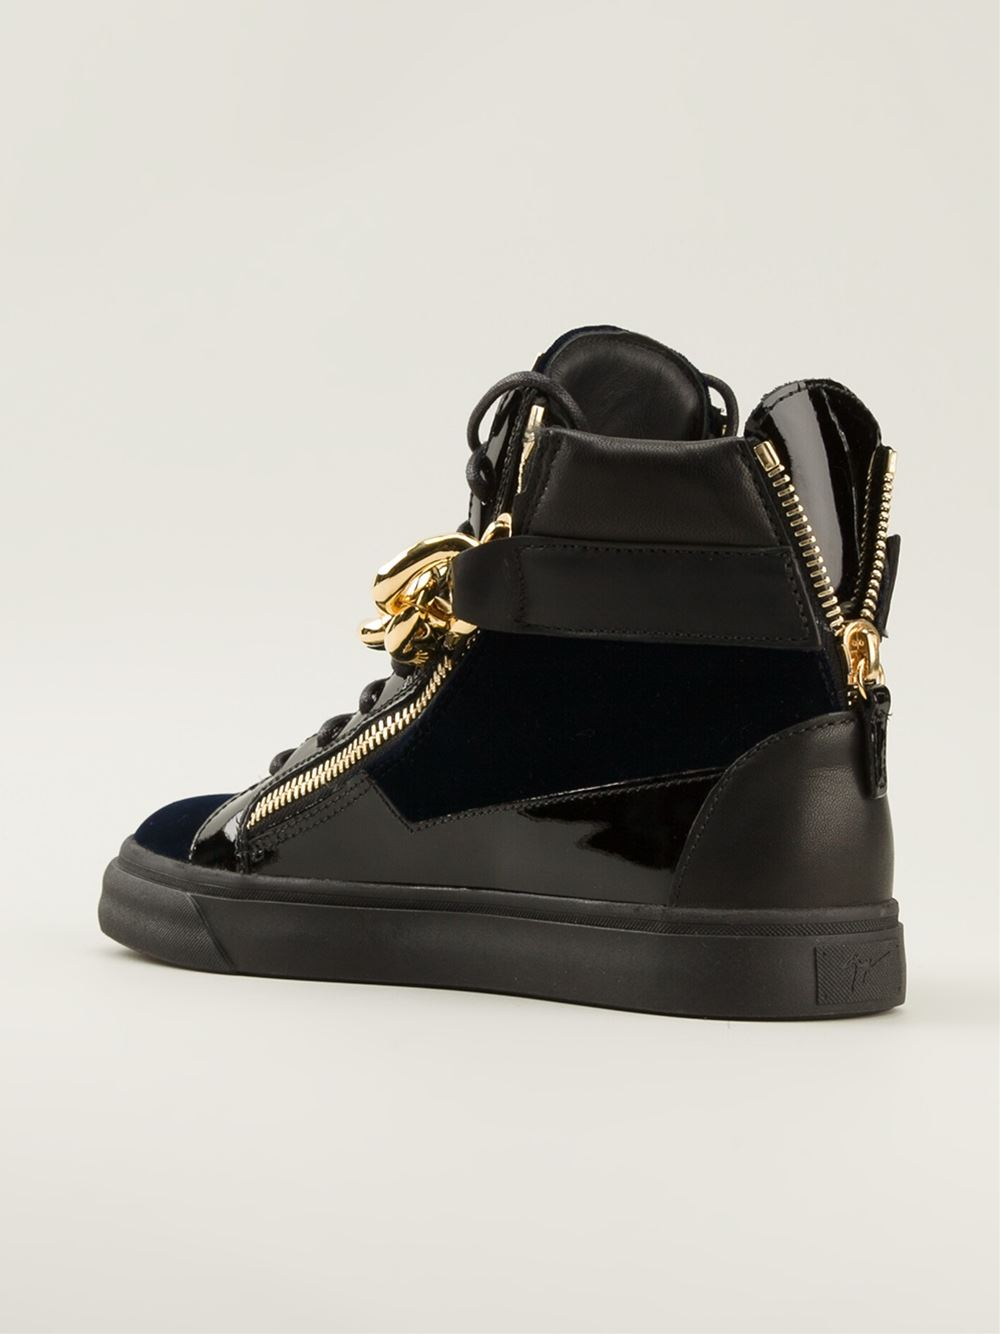 Giuseppe Zanotti Gold Toe Shoe